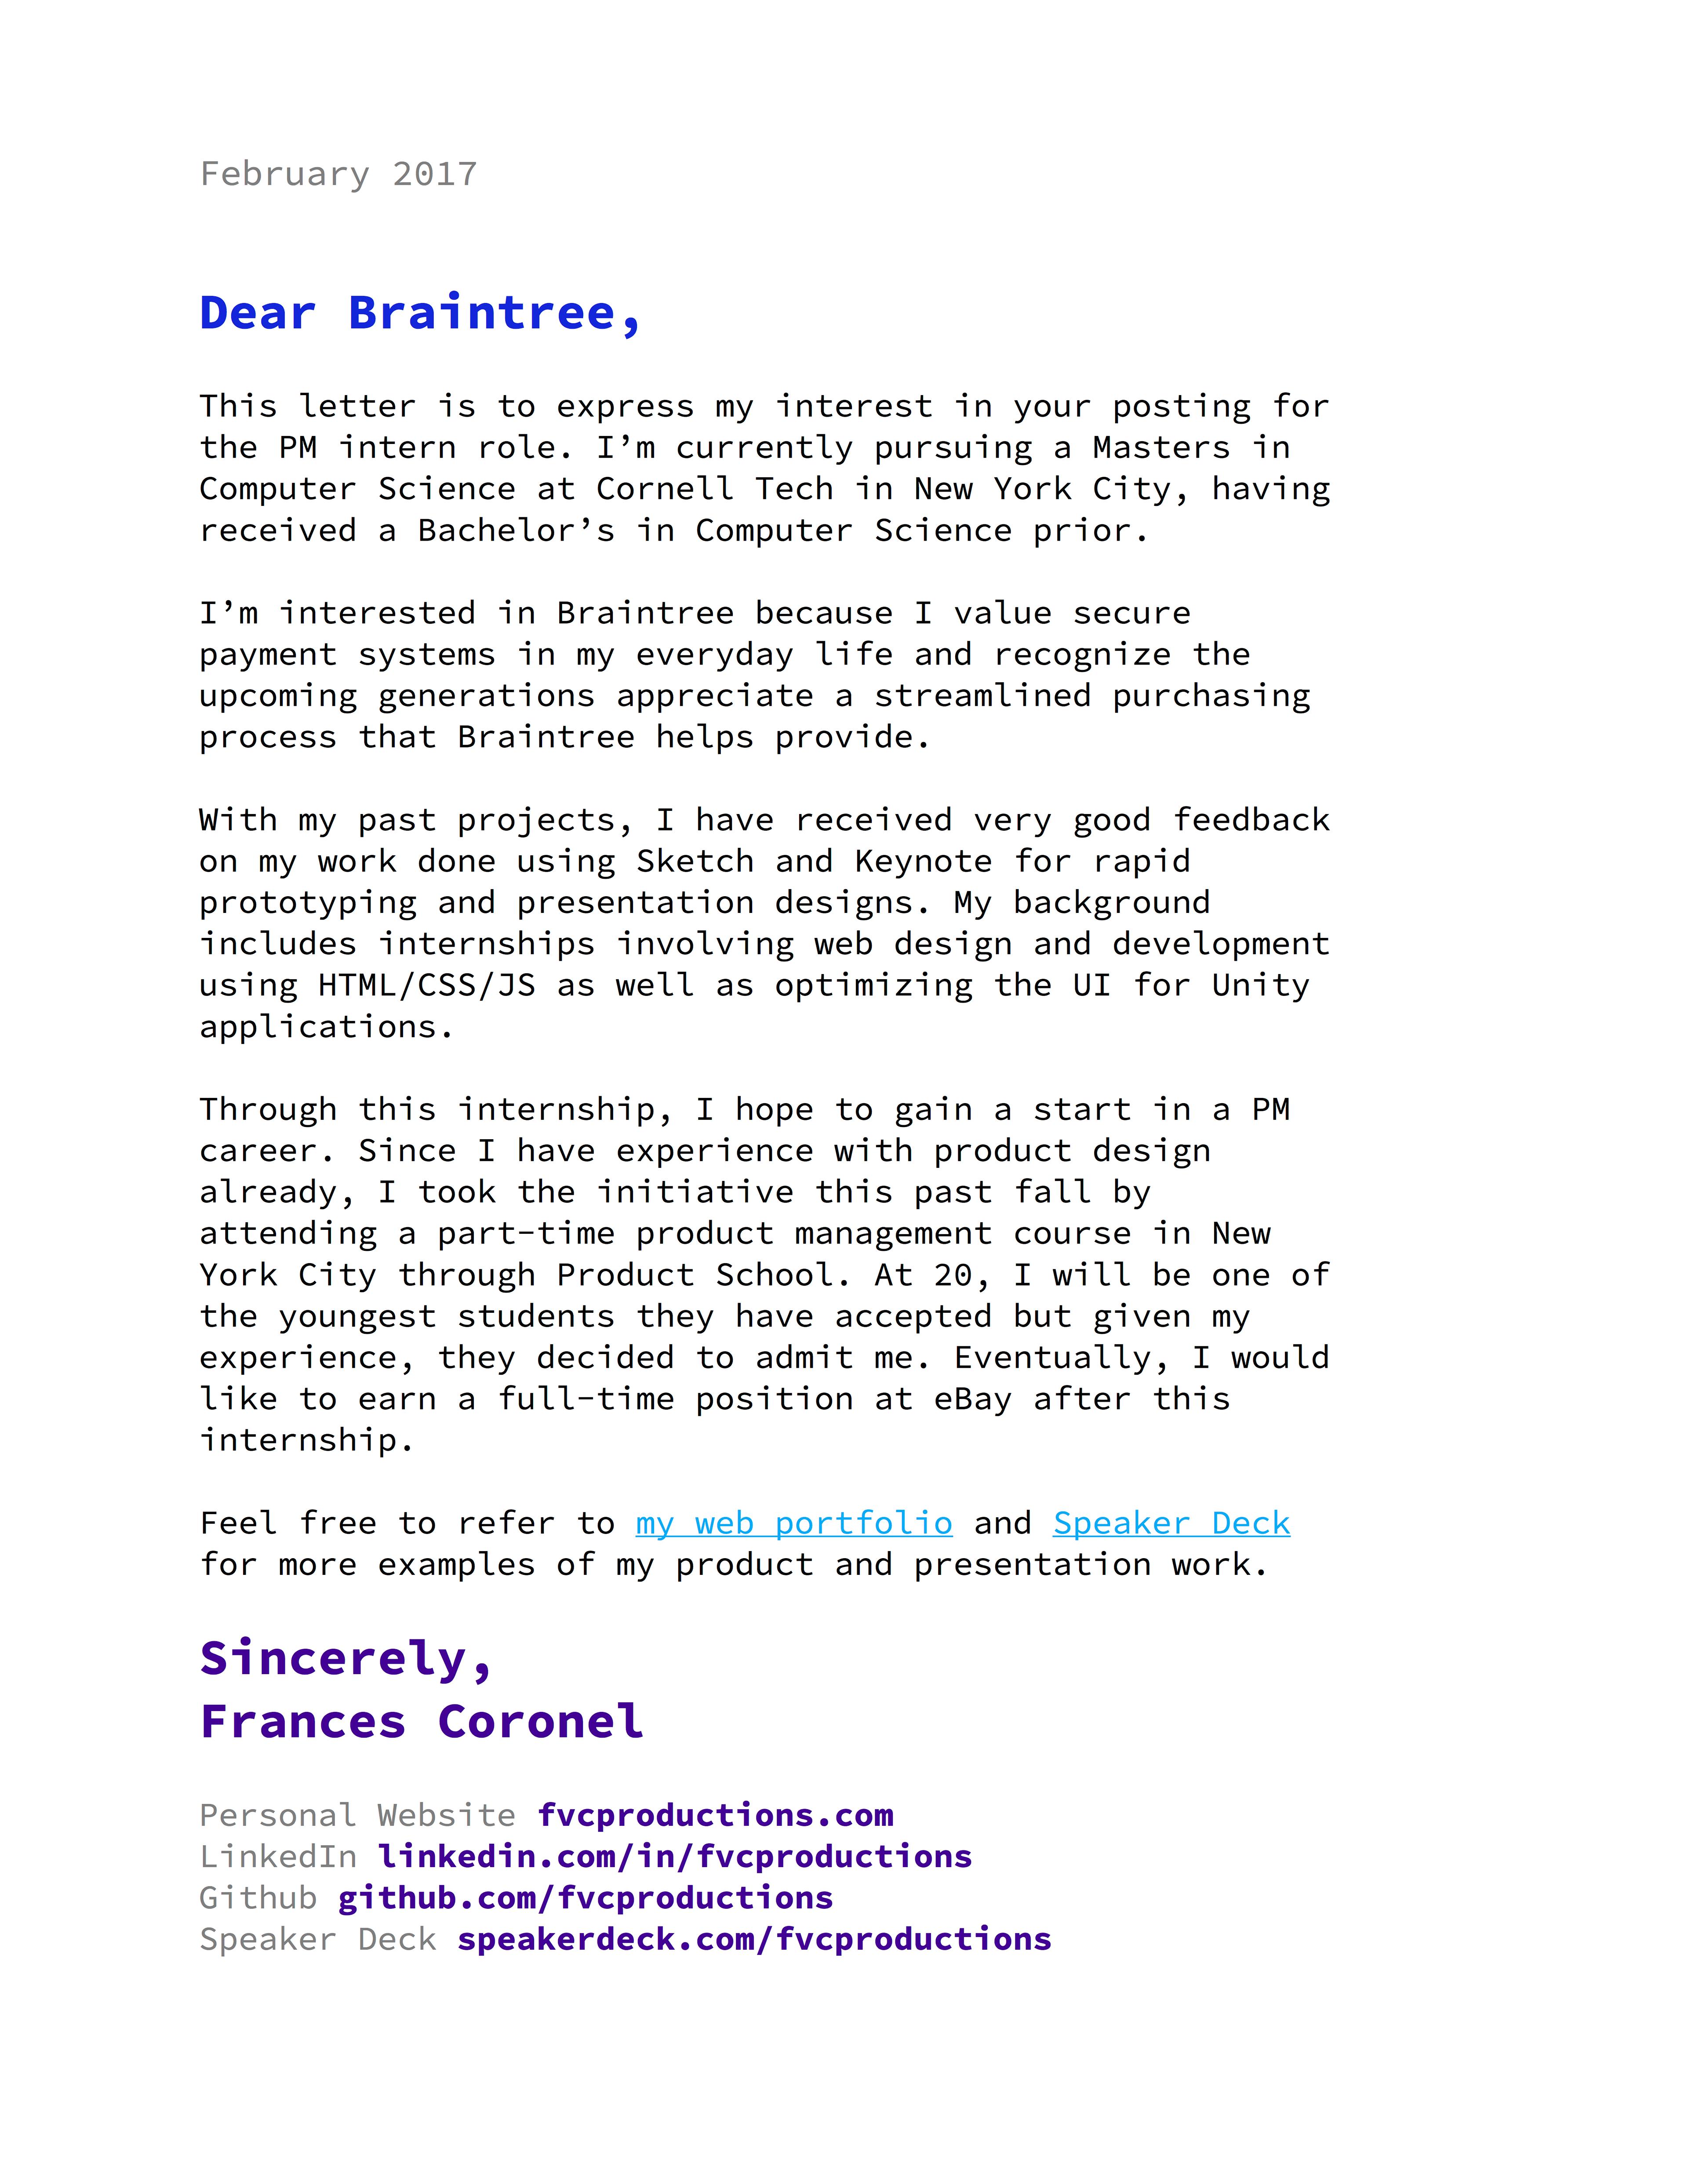 Random Cover Letter Templates Frances Coronel